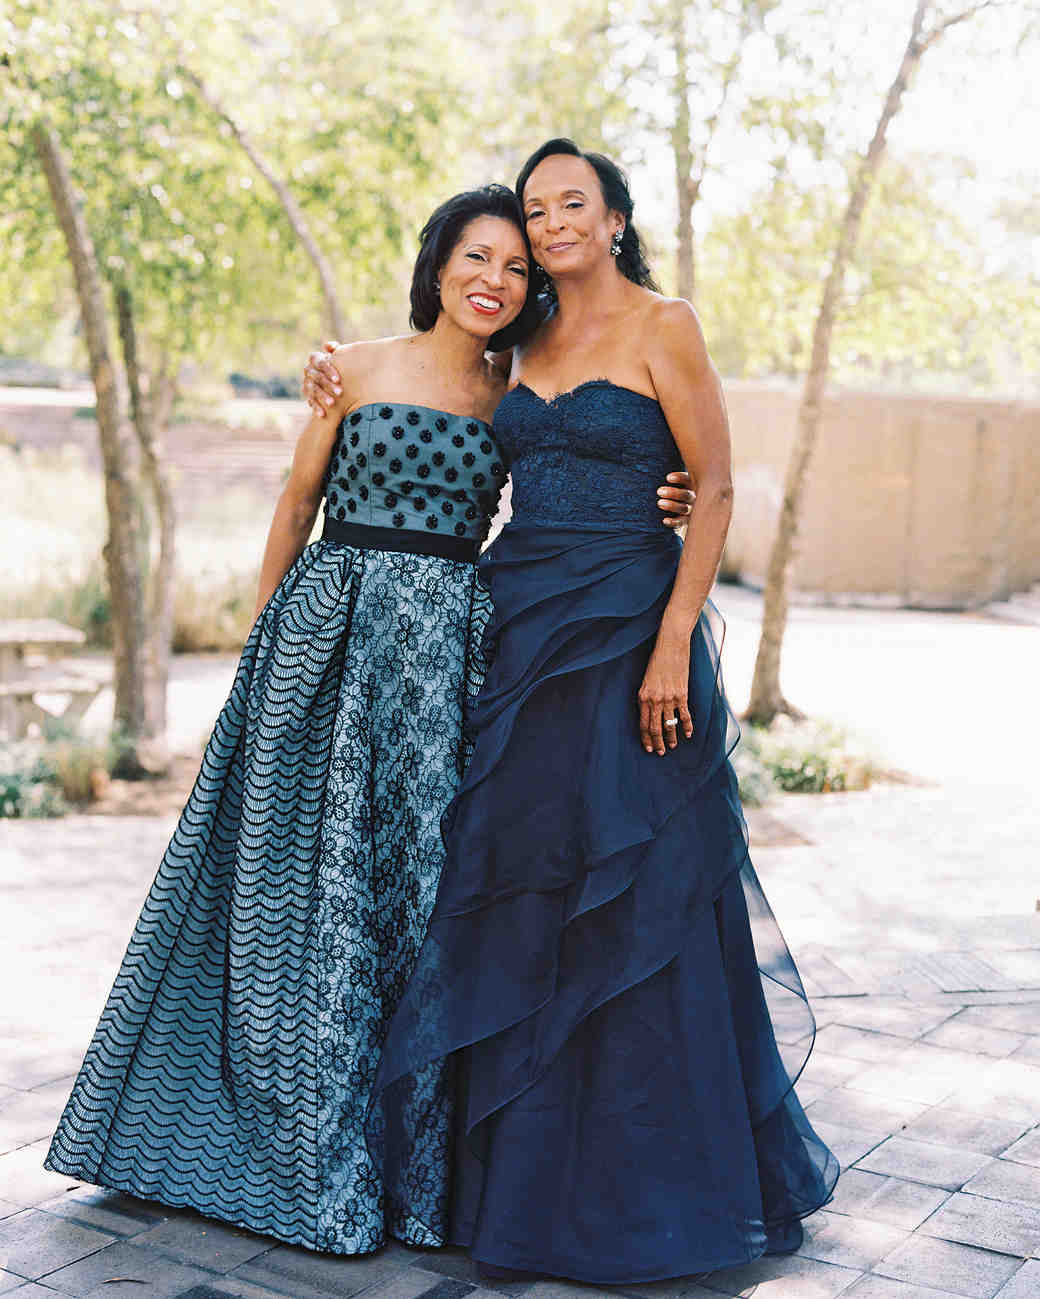 Formal Dresses for Wedding Reception Guests